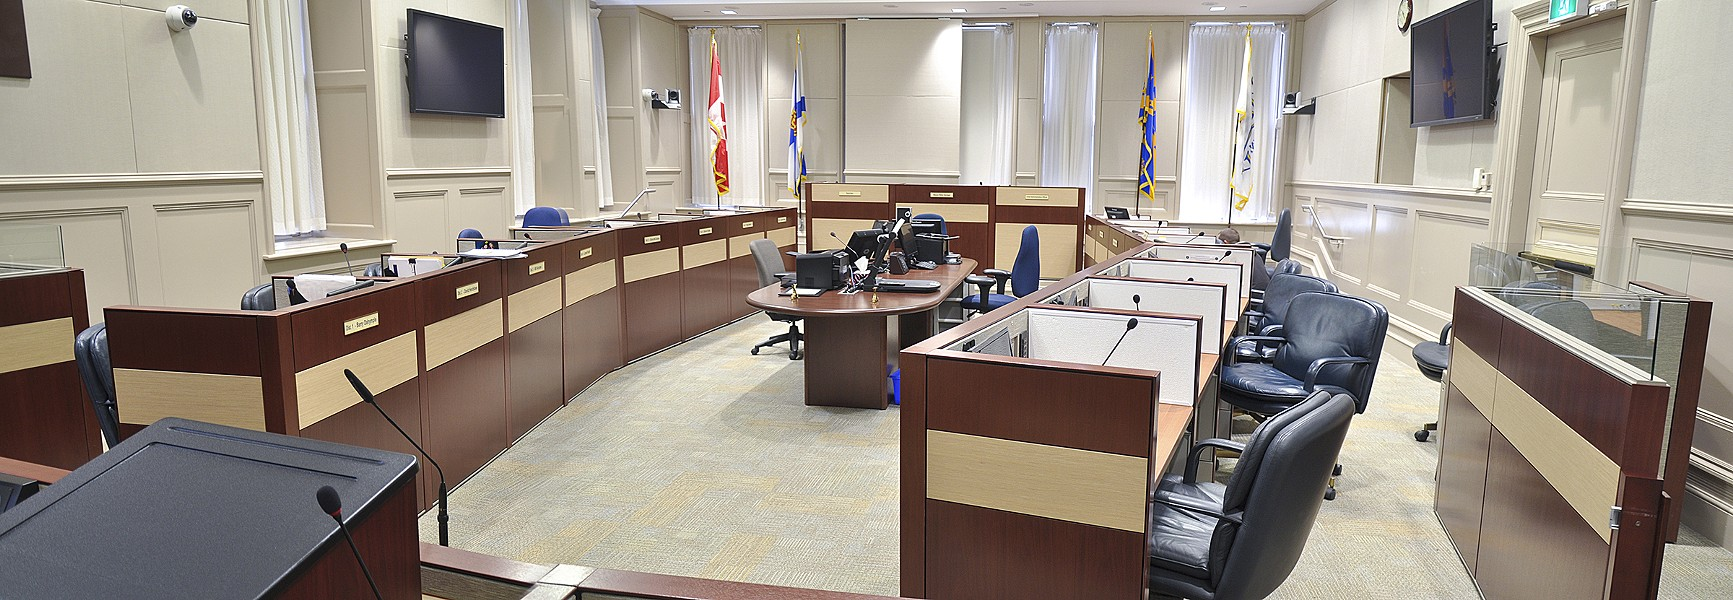 Council chambers inside City Hall. - VIA HRM